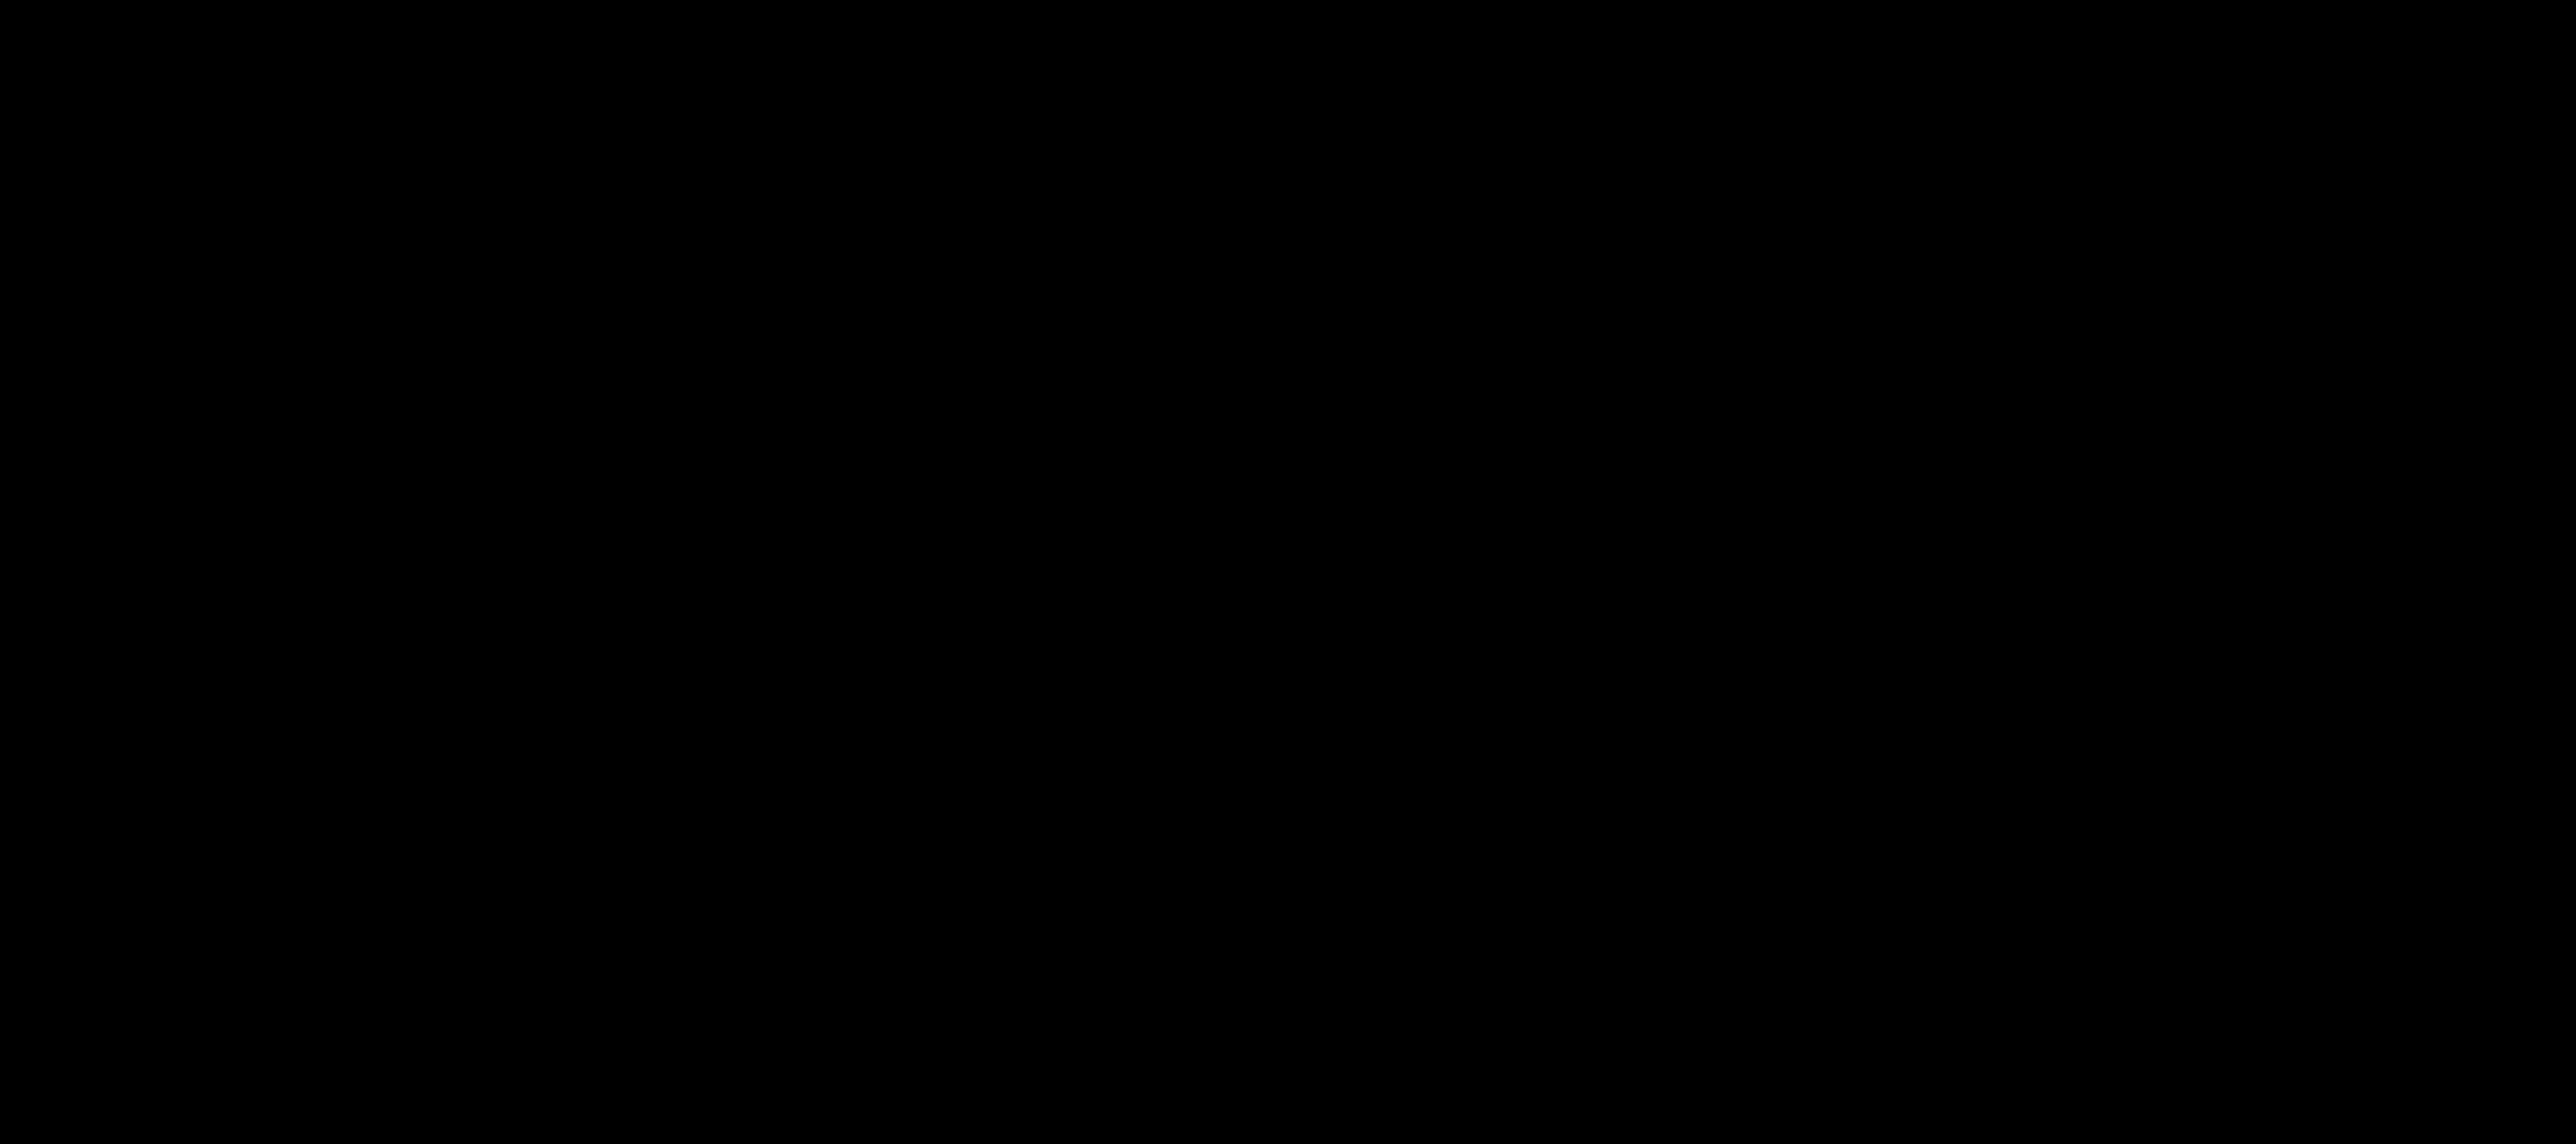 Peptide C105Y N/A - ontores